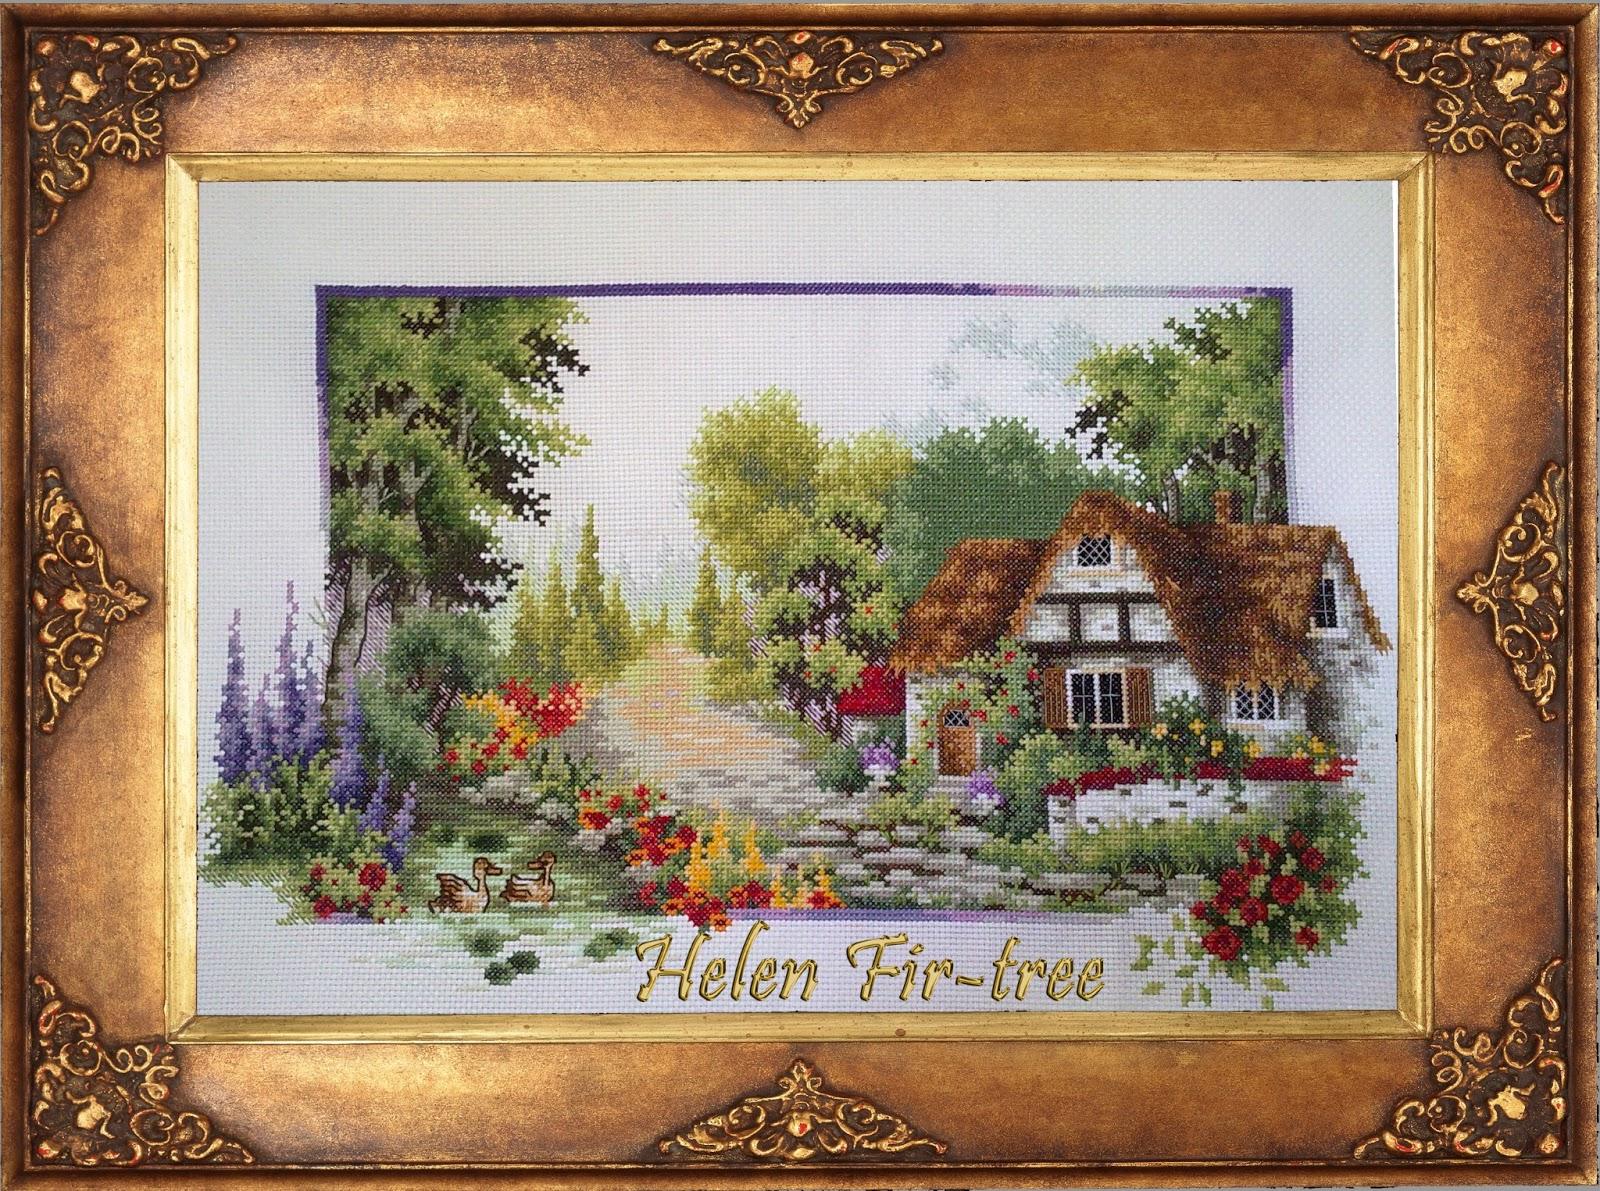 Hwlwn Fir-tree вышивка крестом  времена года Лето counted cross stitch seasons summer